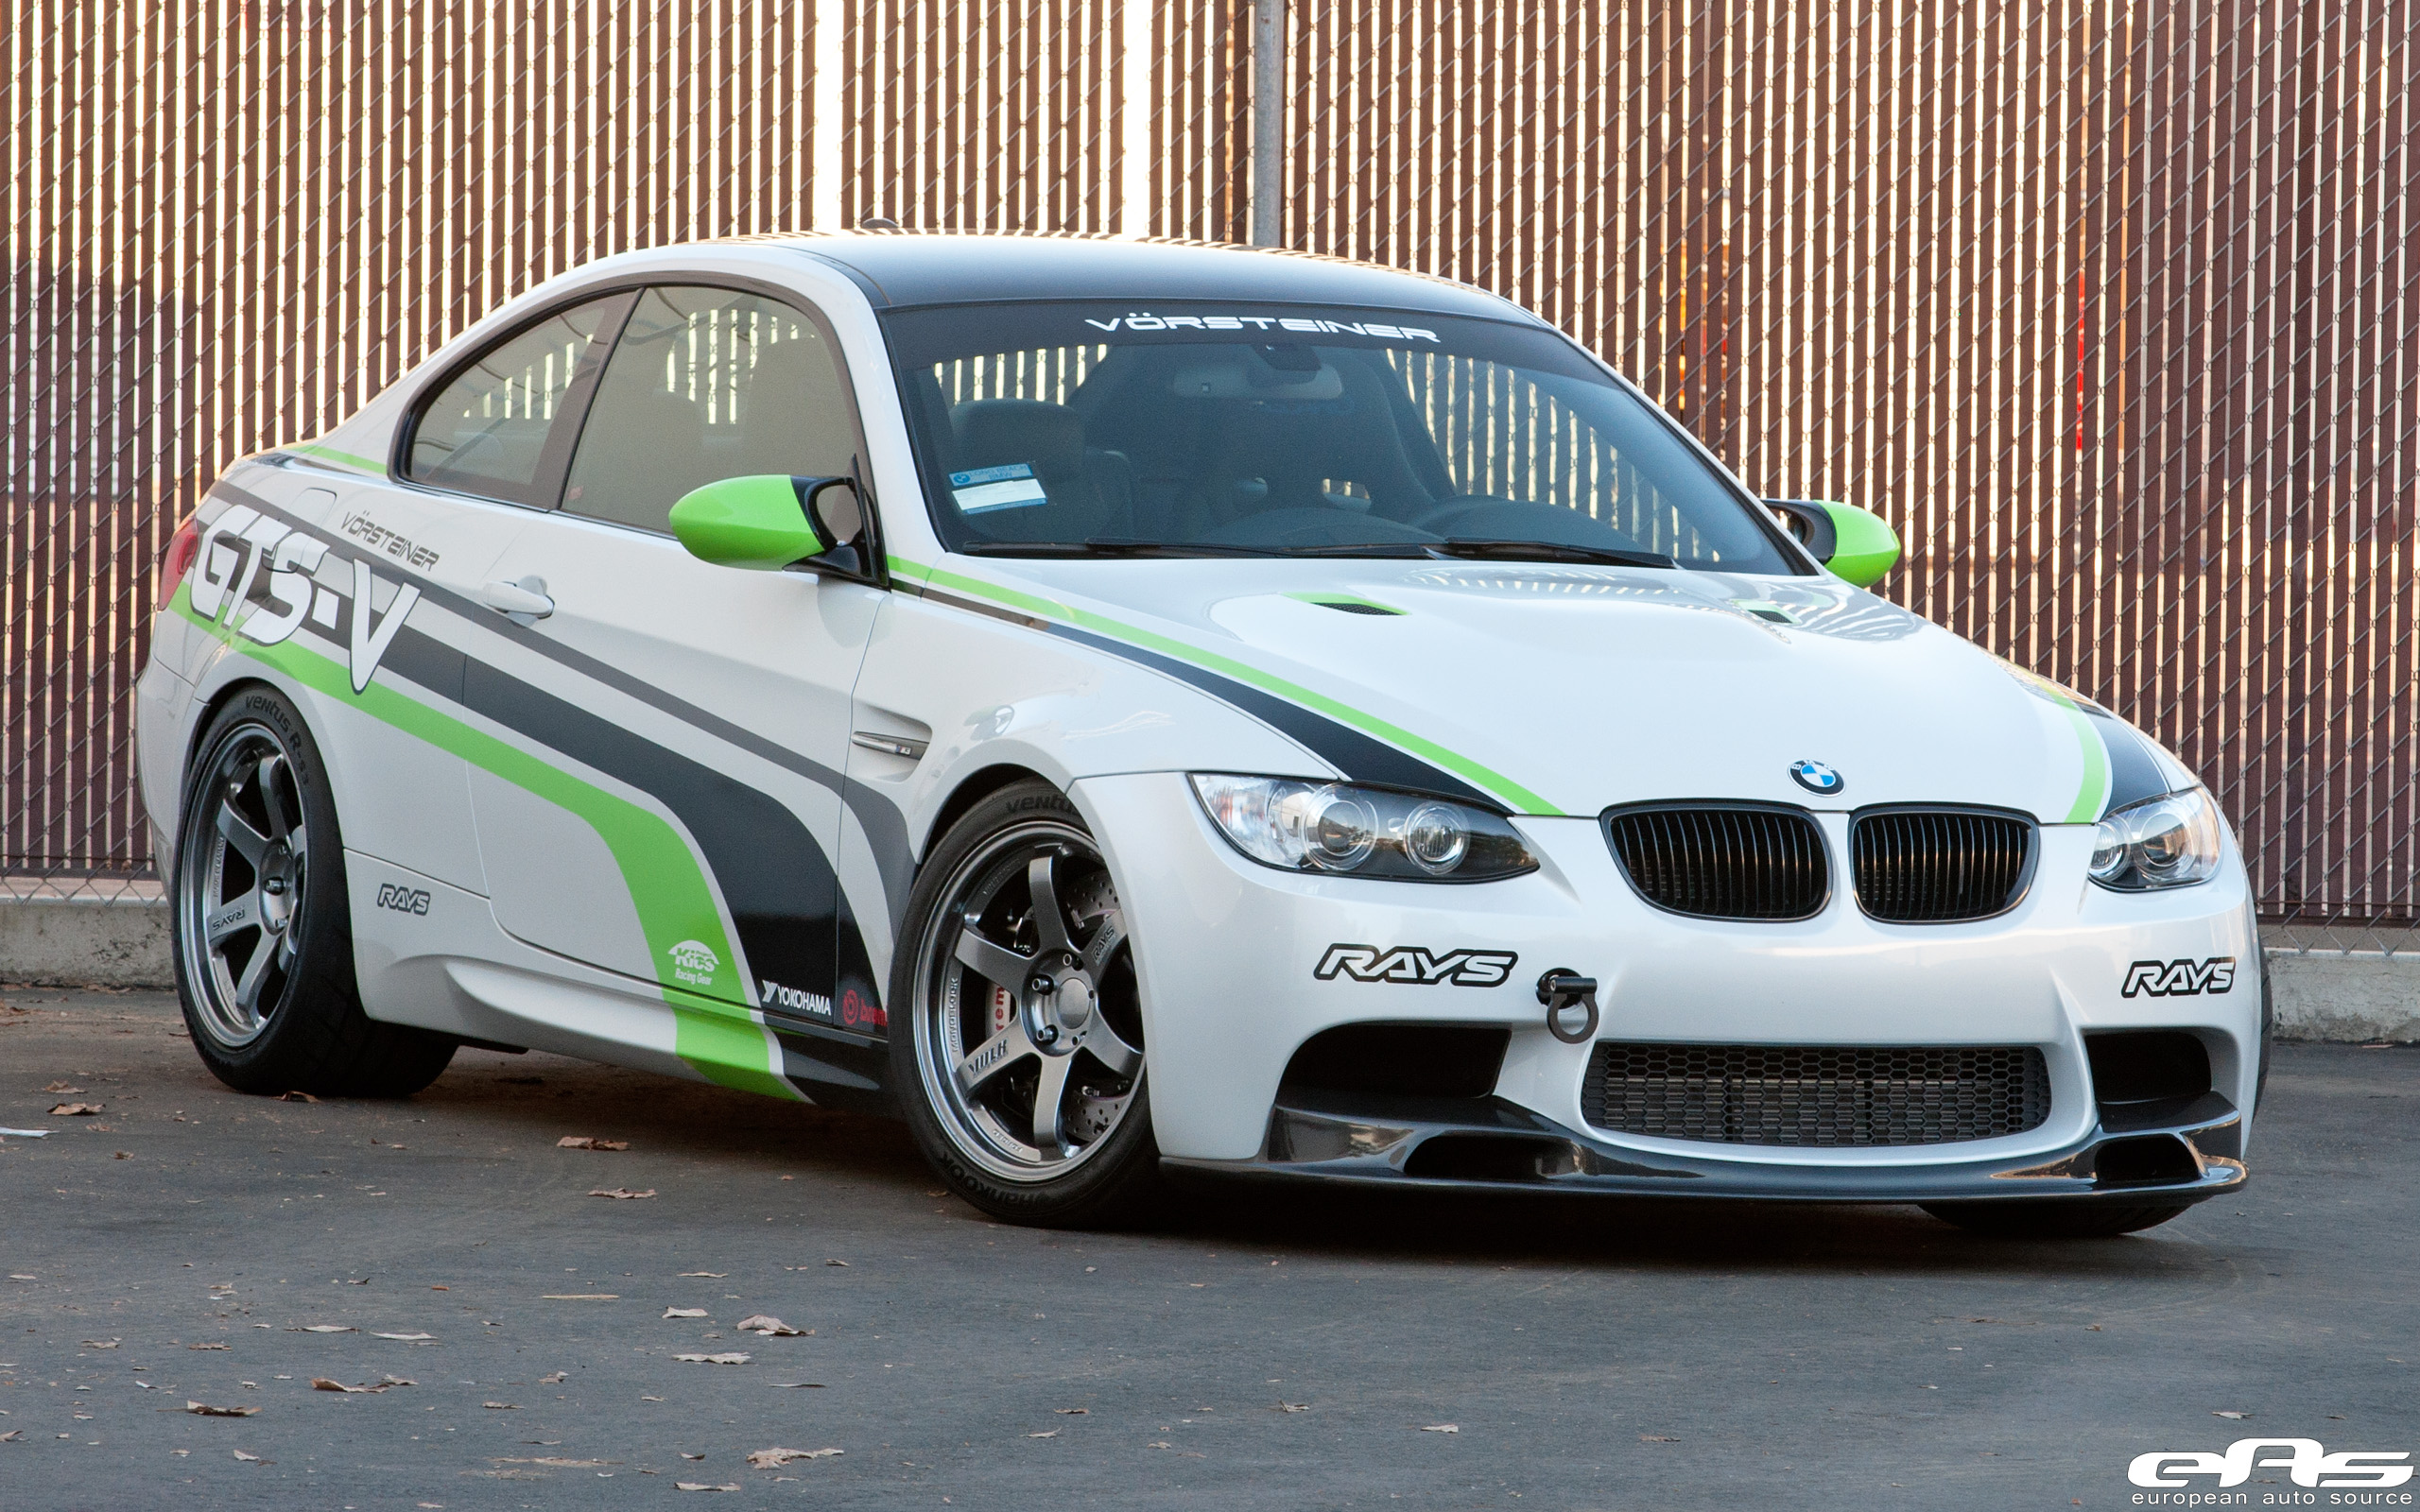 BMW I8 Top Speed >> First Look: New Vorsteiner GTS-V Parts on SEMA 2011 Build